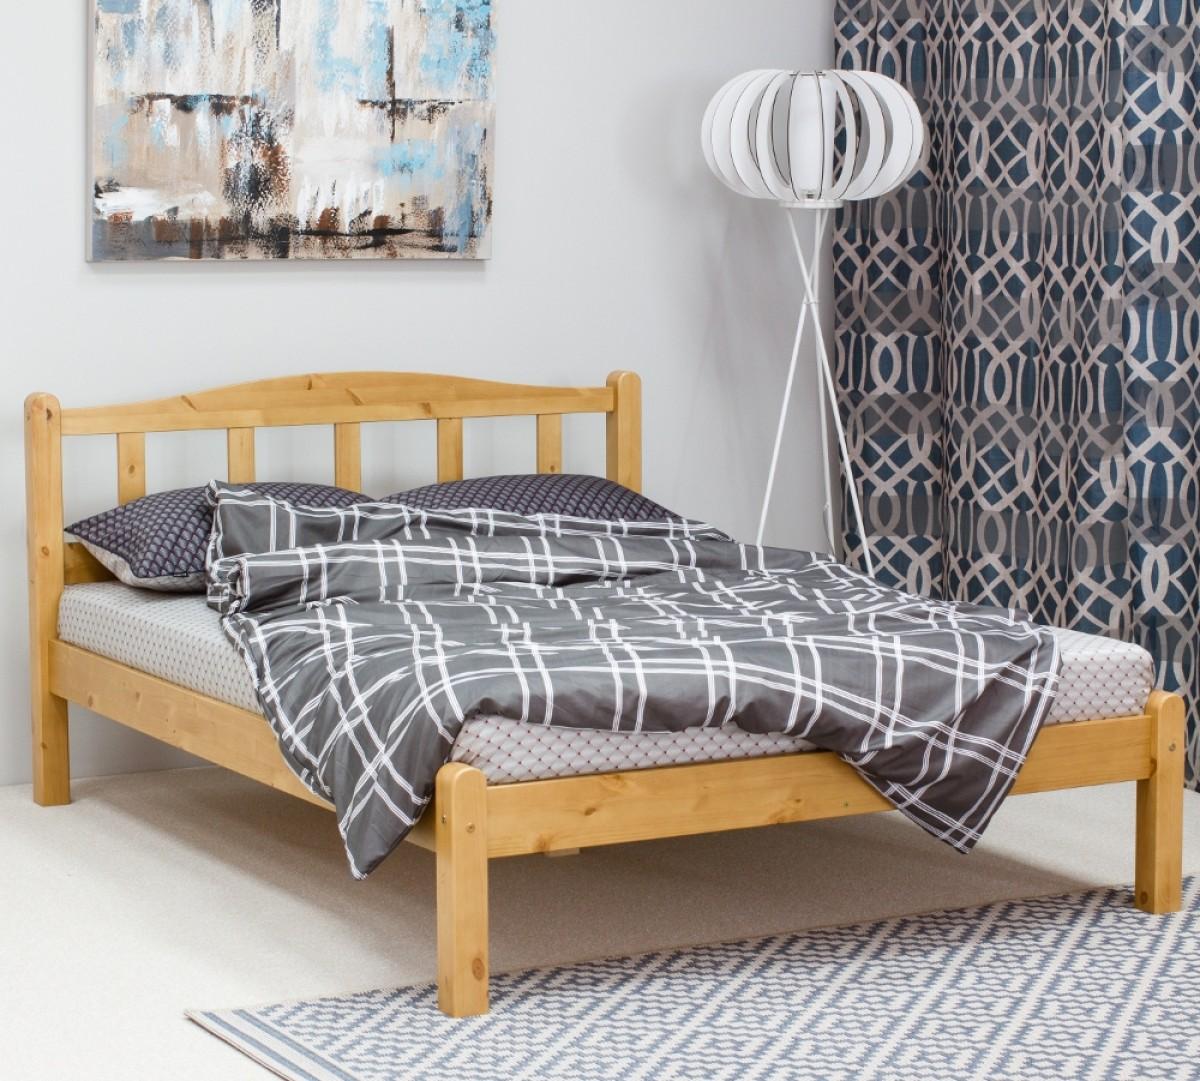 Amberley Antique Pine Wooden Bed